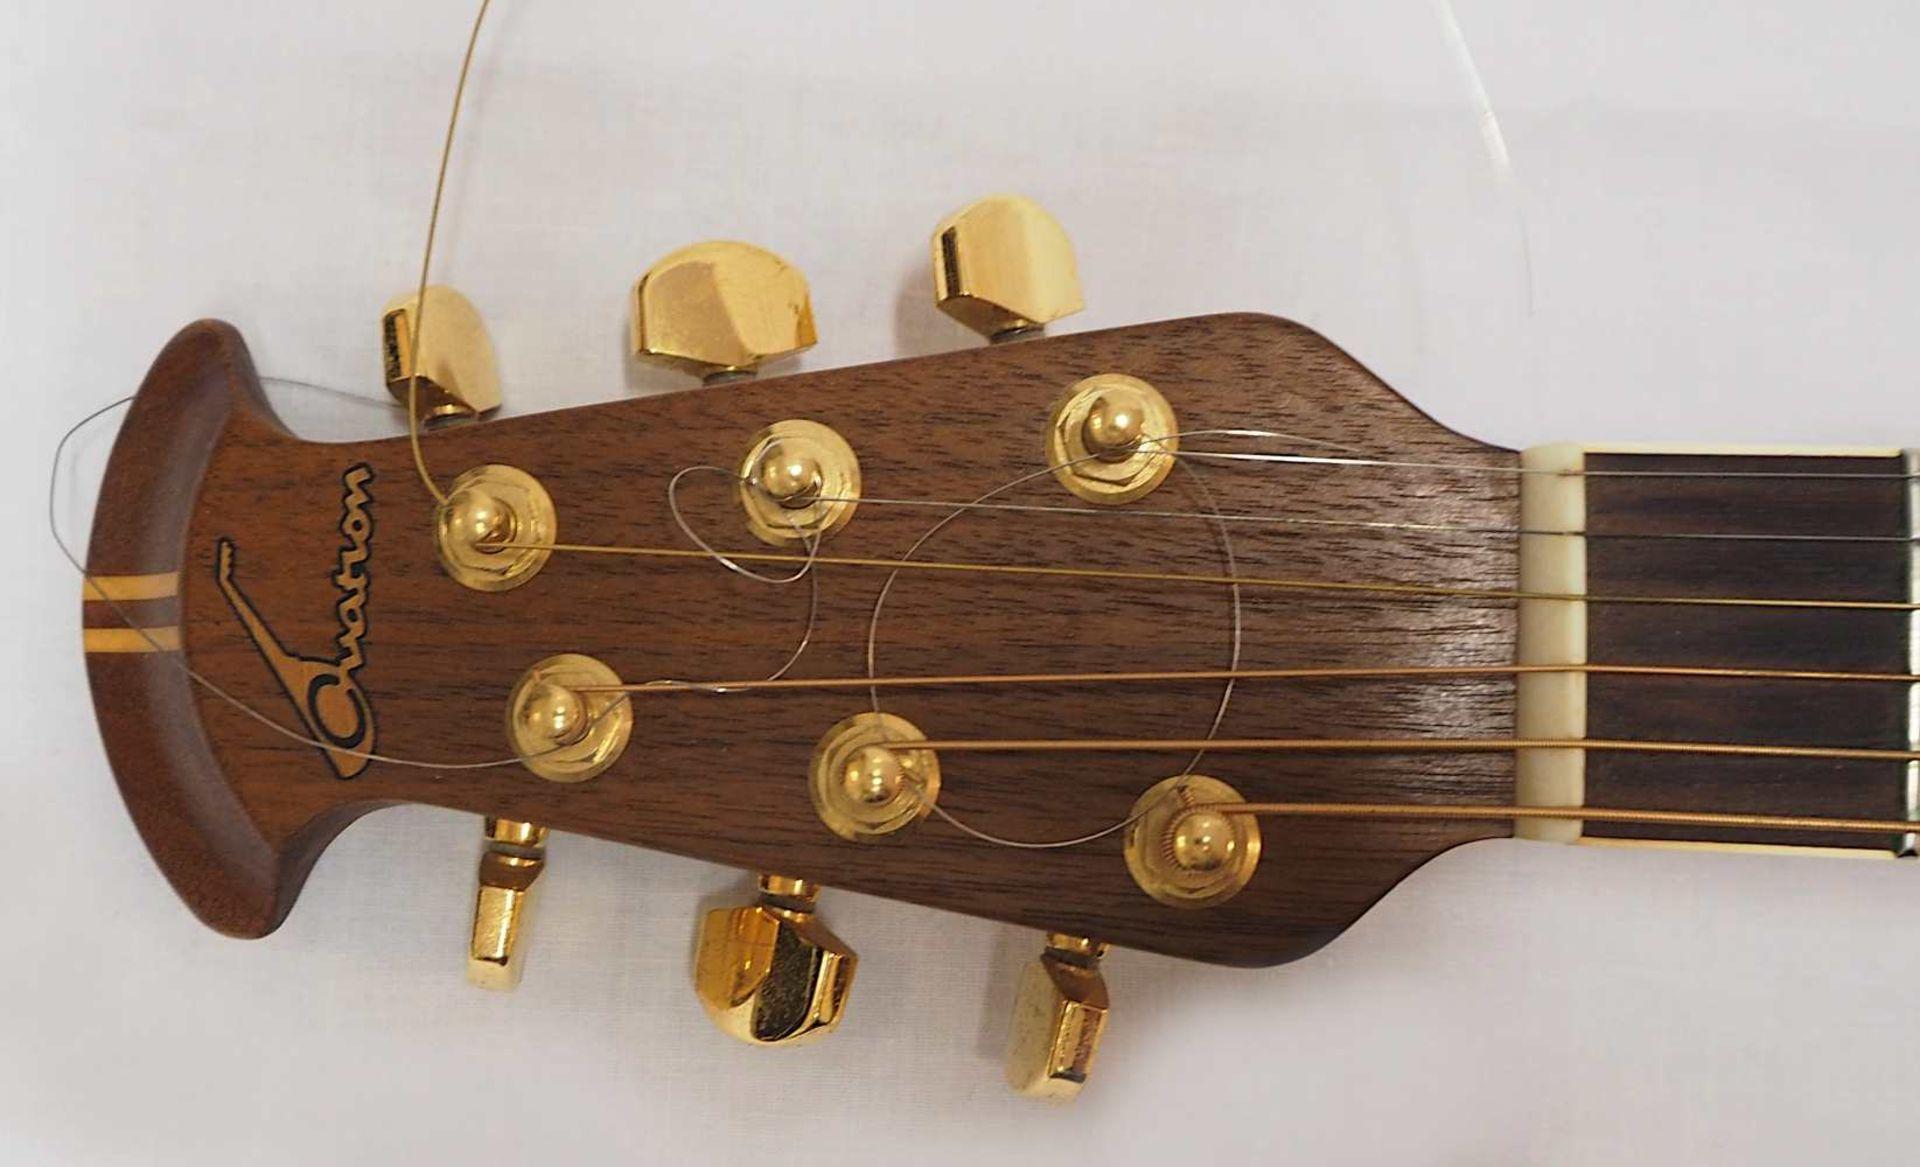 "1 Akustikgitarre OVATION ""Nr. 493 Collector's Series'98, New Hartford, CT./USA"" Holz m - Bild 3 aus 5"